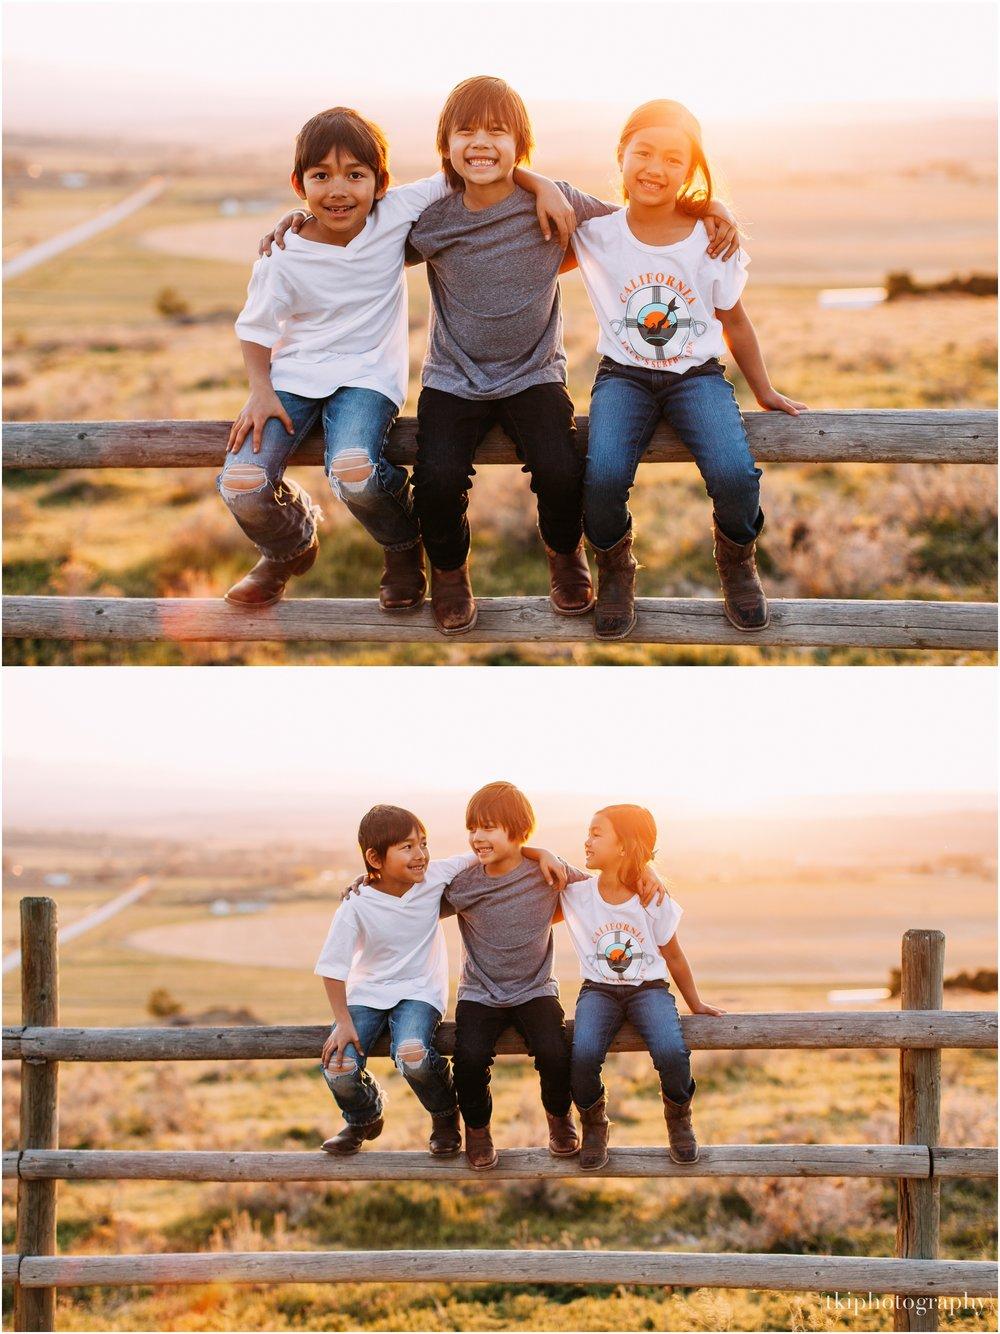 Montana-Portraits-Ranch-Sunset_0002.jpg